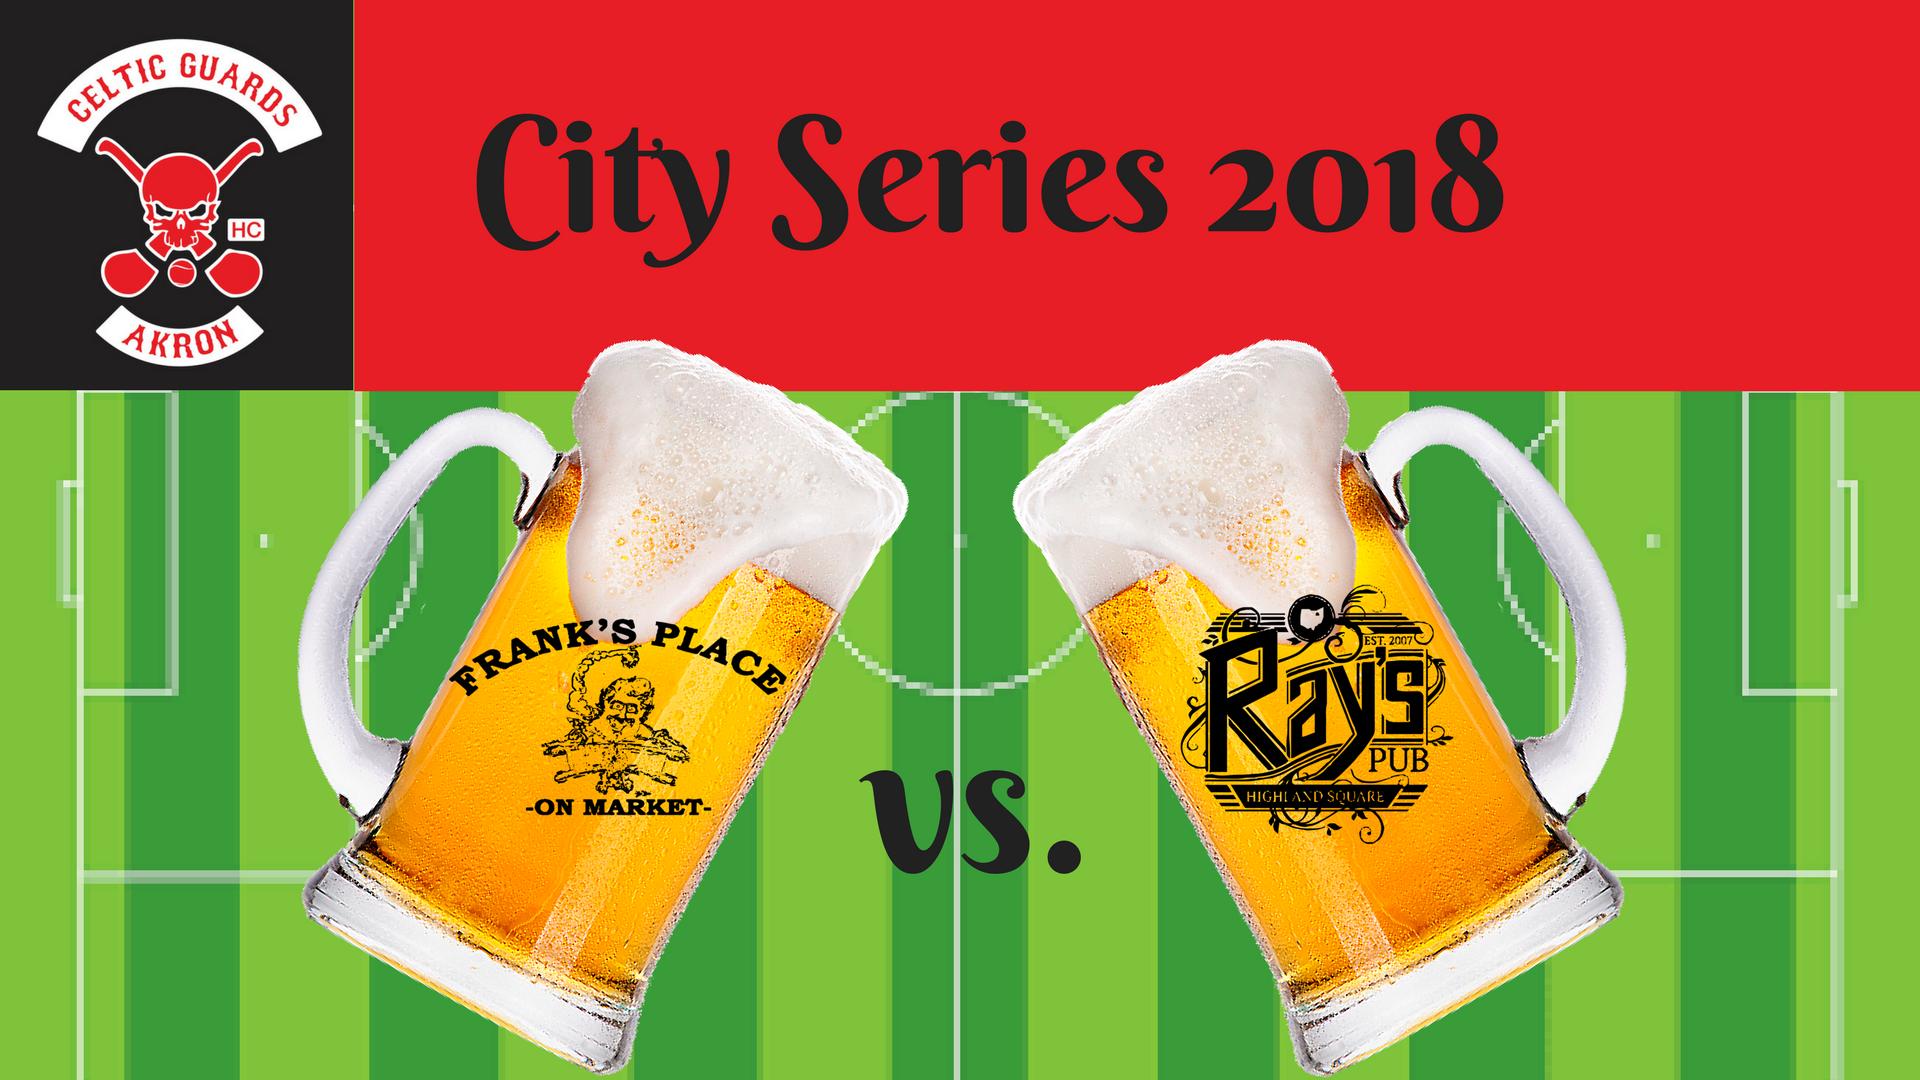 Akron-celtic-guards-city-series-2018.png